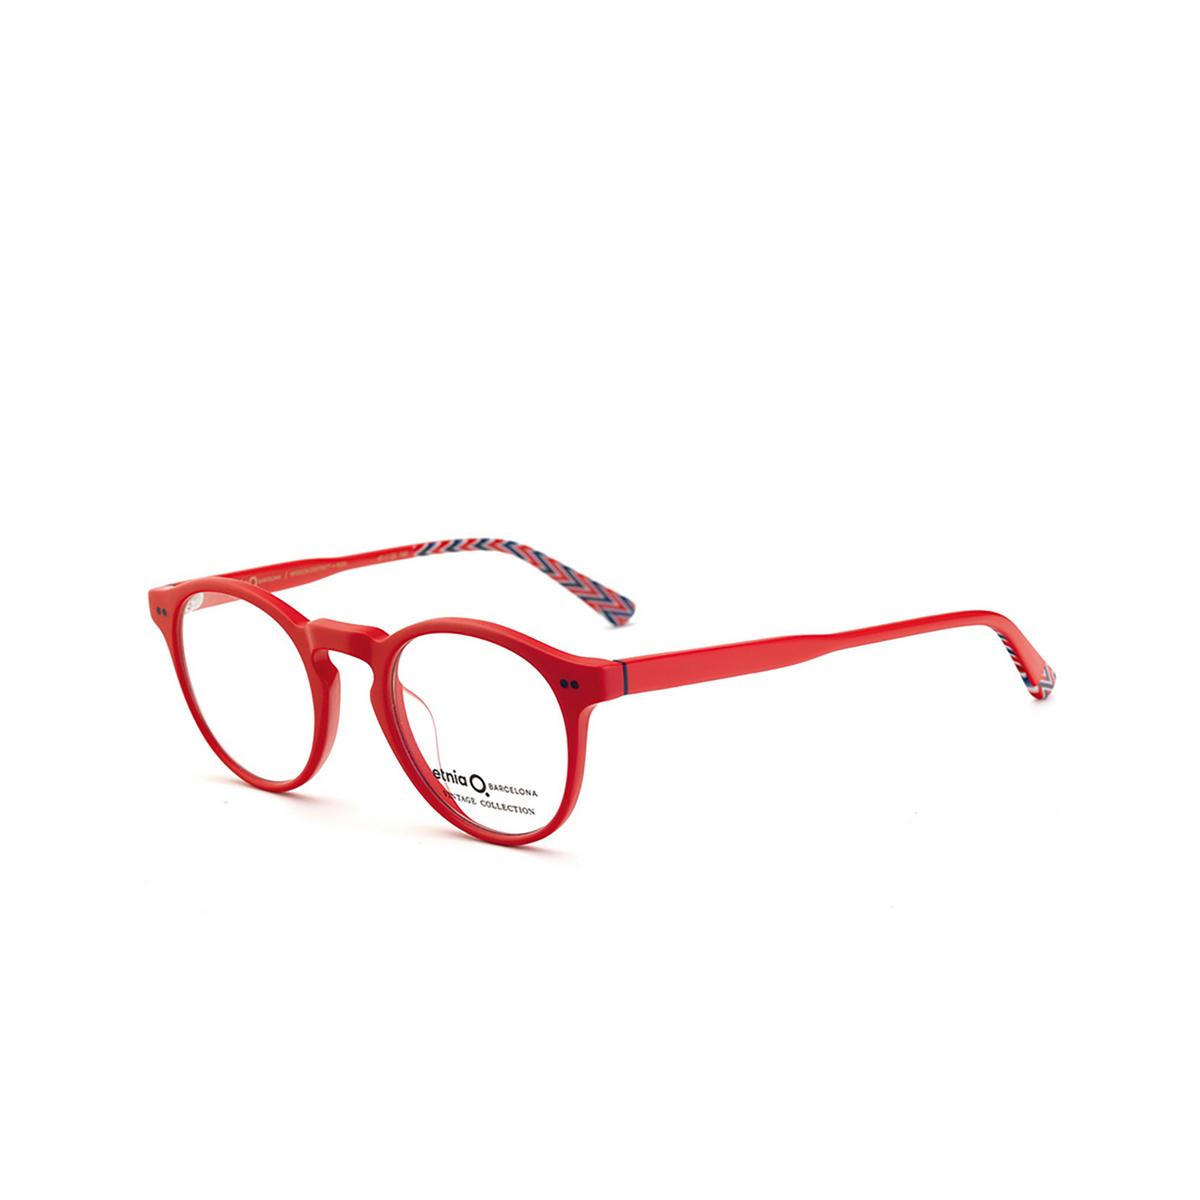 Etnia Barcelona® Round Eyeglasses: Mission District color Rdbl - three-quarters view.